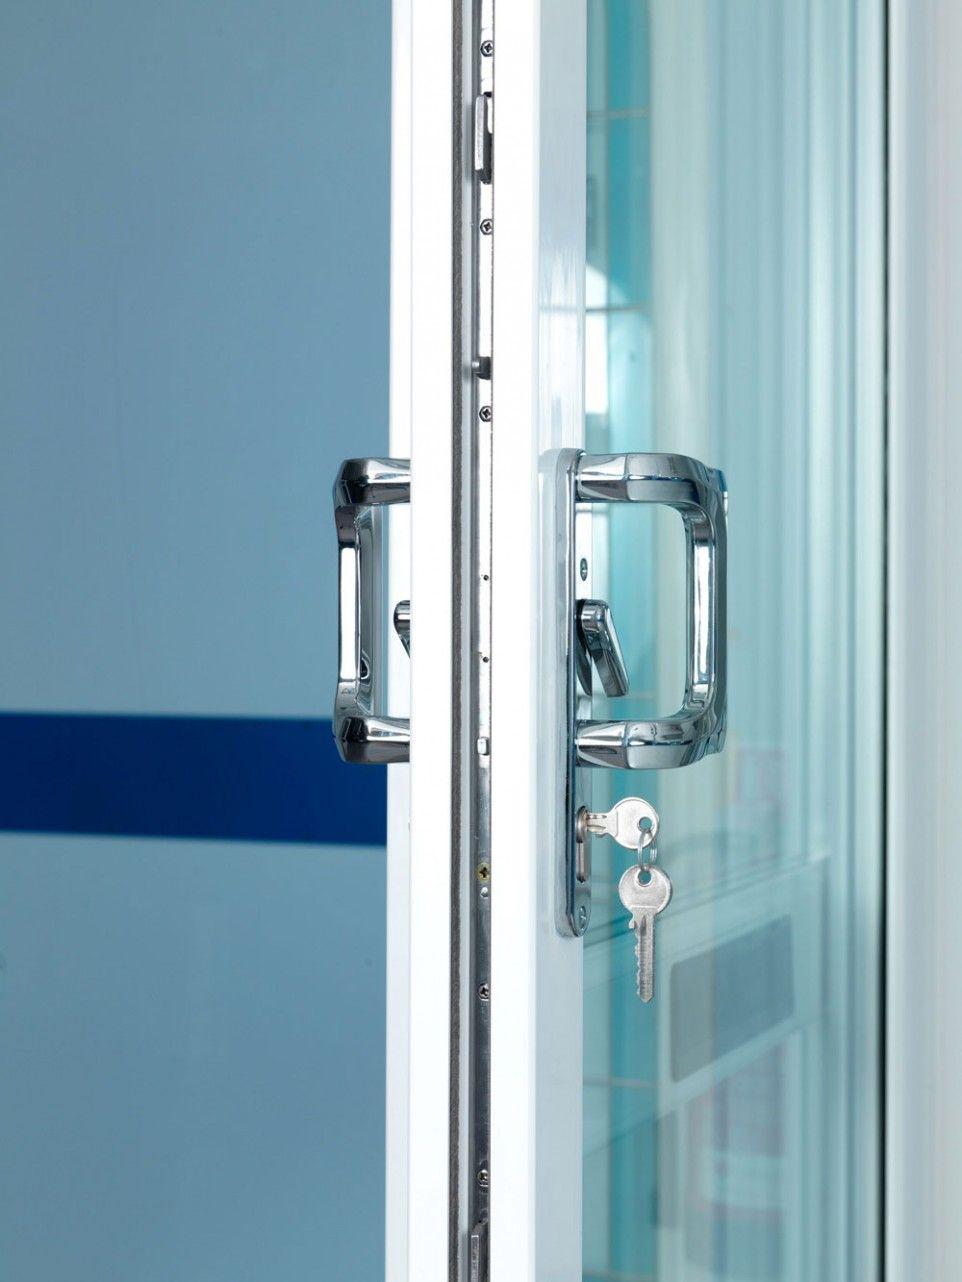 Sliding Sliding Patio Door Lock Patio Door Locks Door Handle Design Sliding Patio Doors